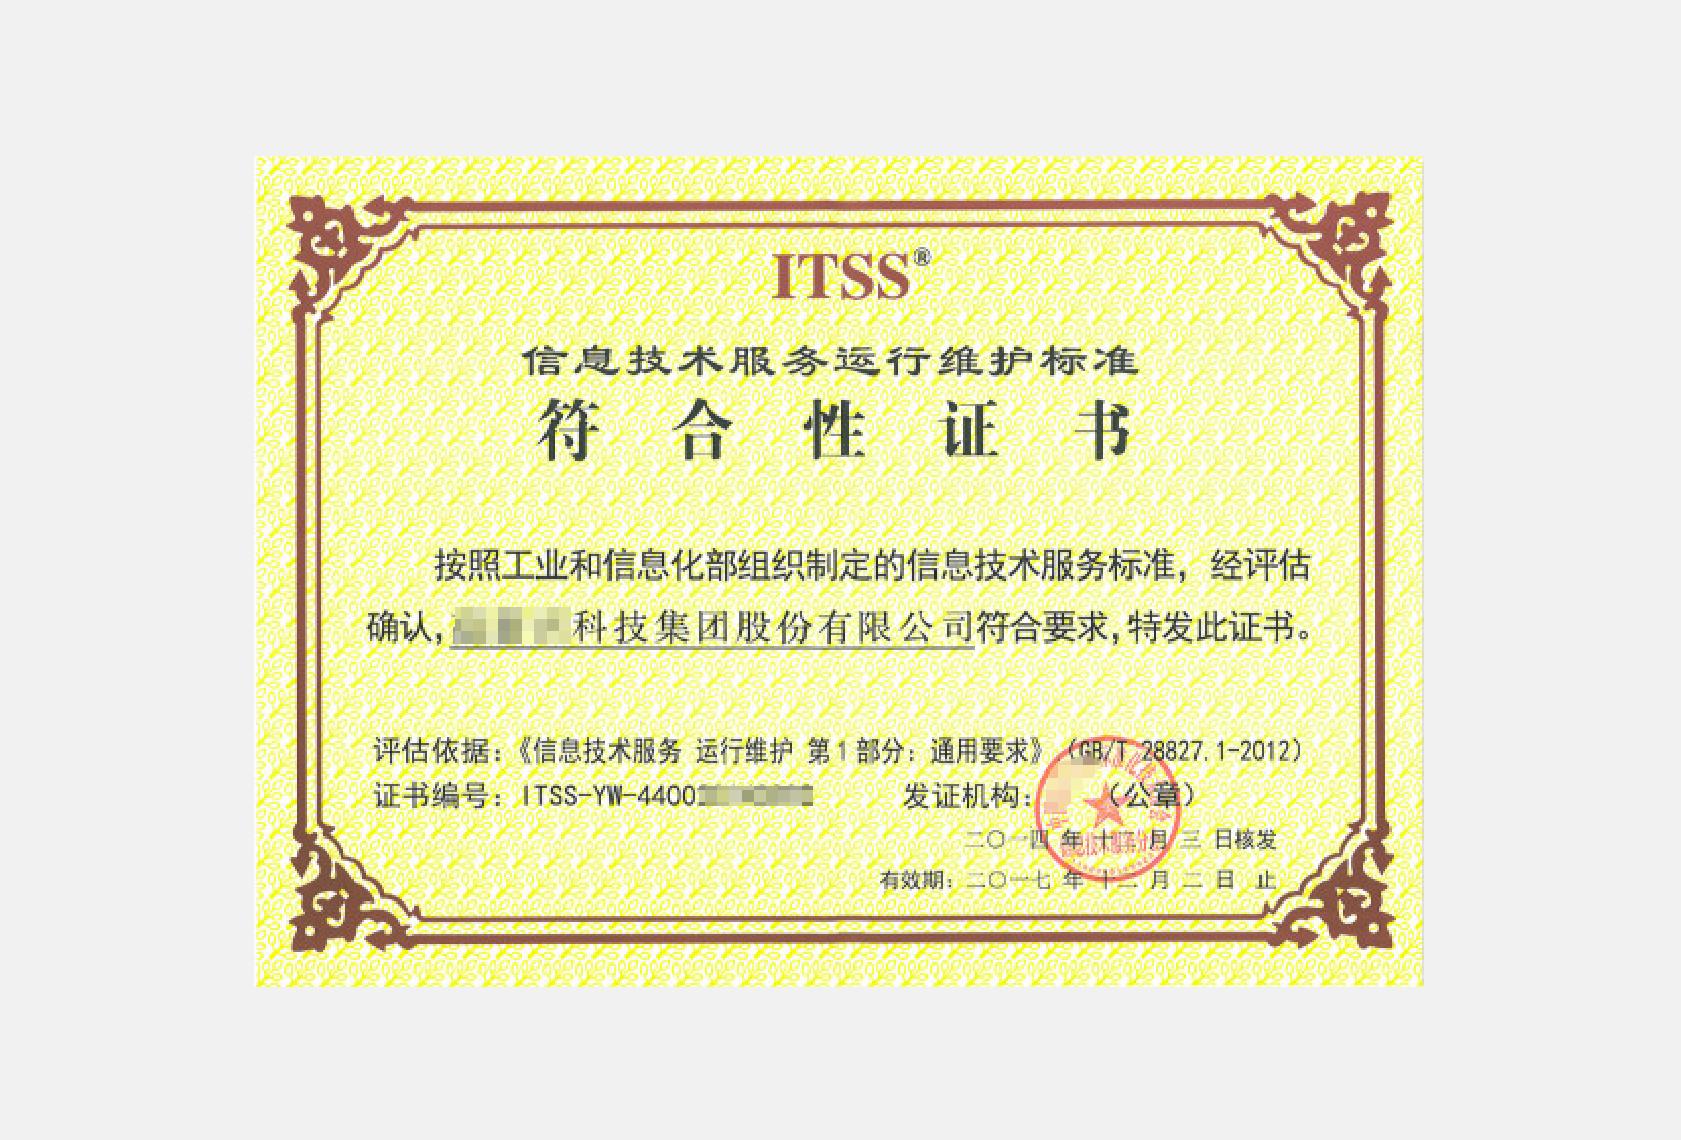 itss认证详细介绍   itss认证核心要素_itss认证知识介绍